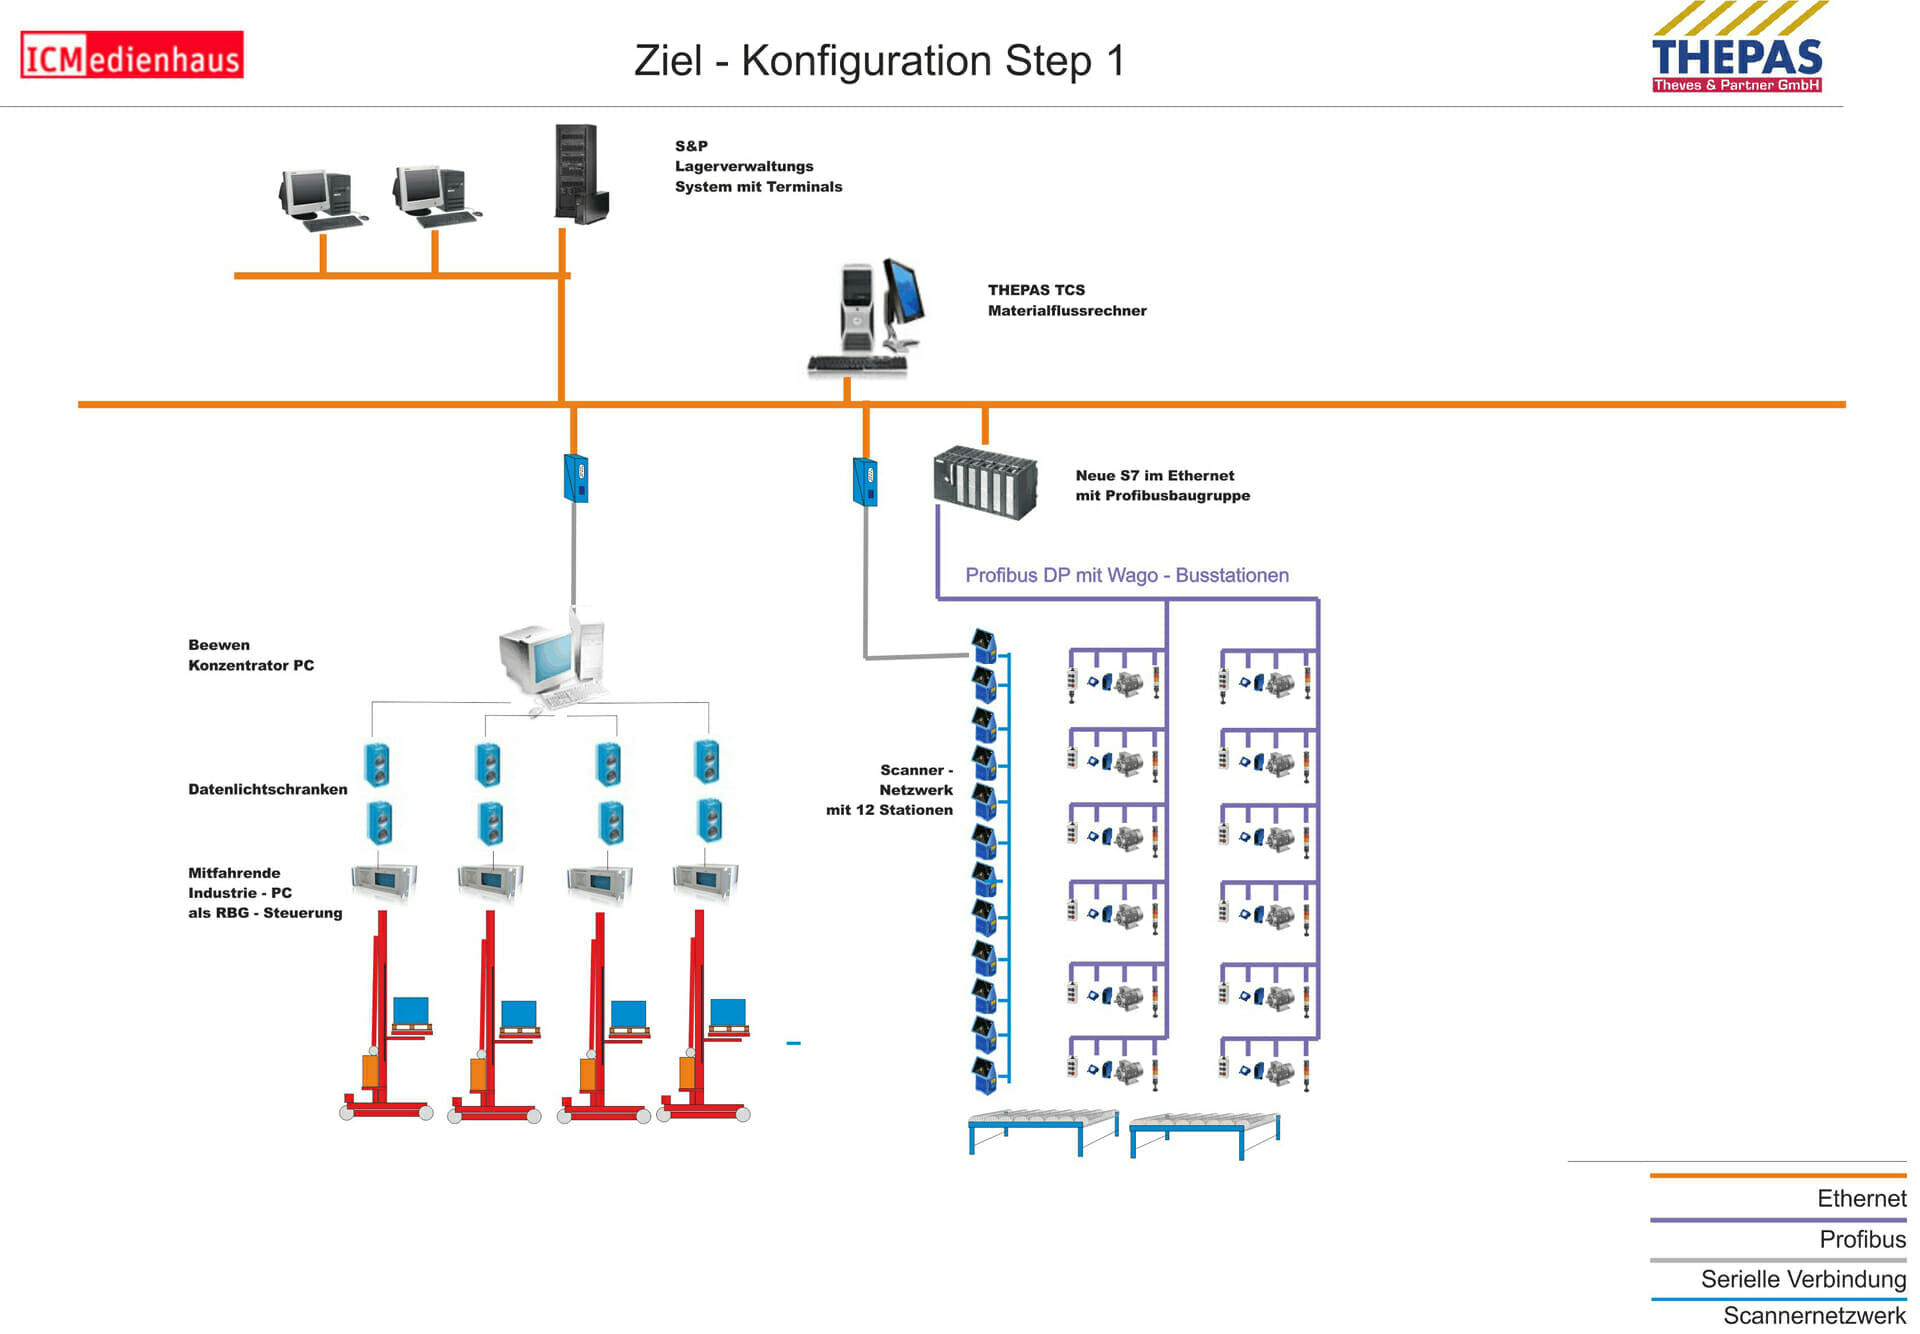 Konfiguration Step 1